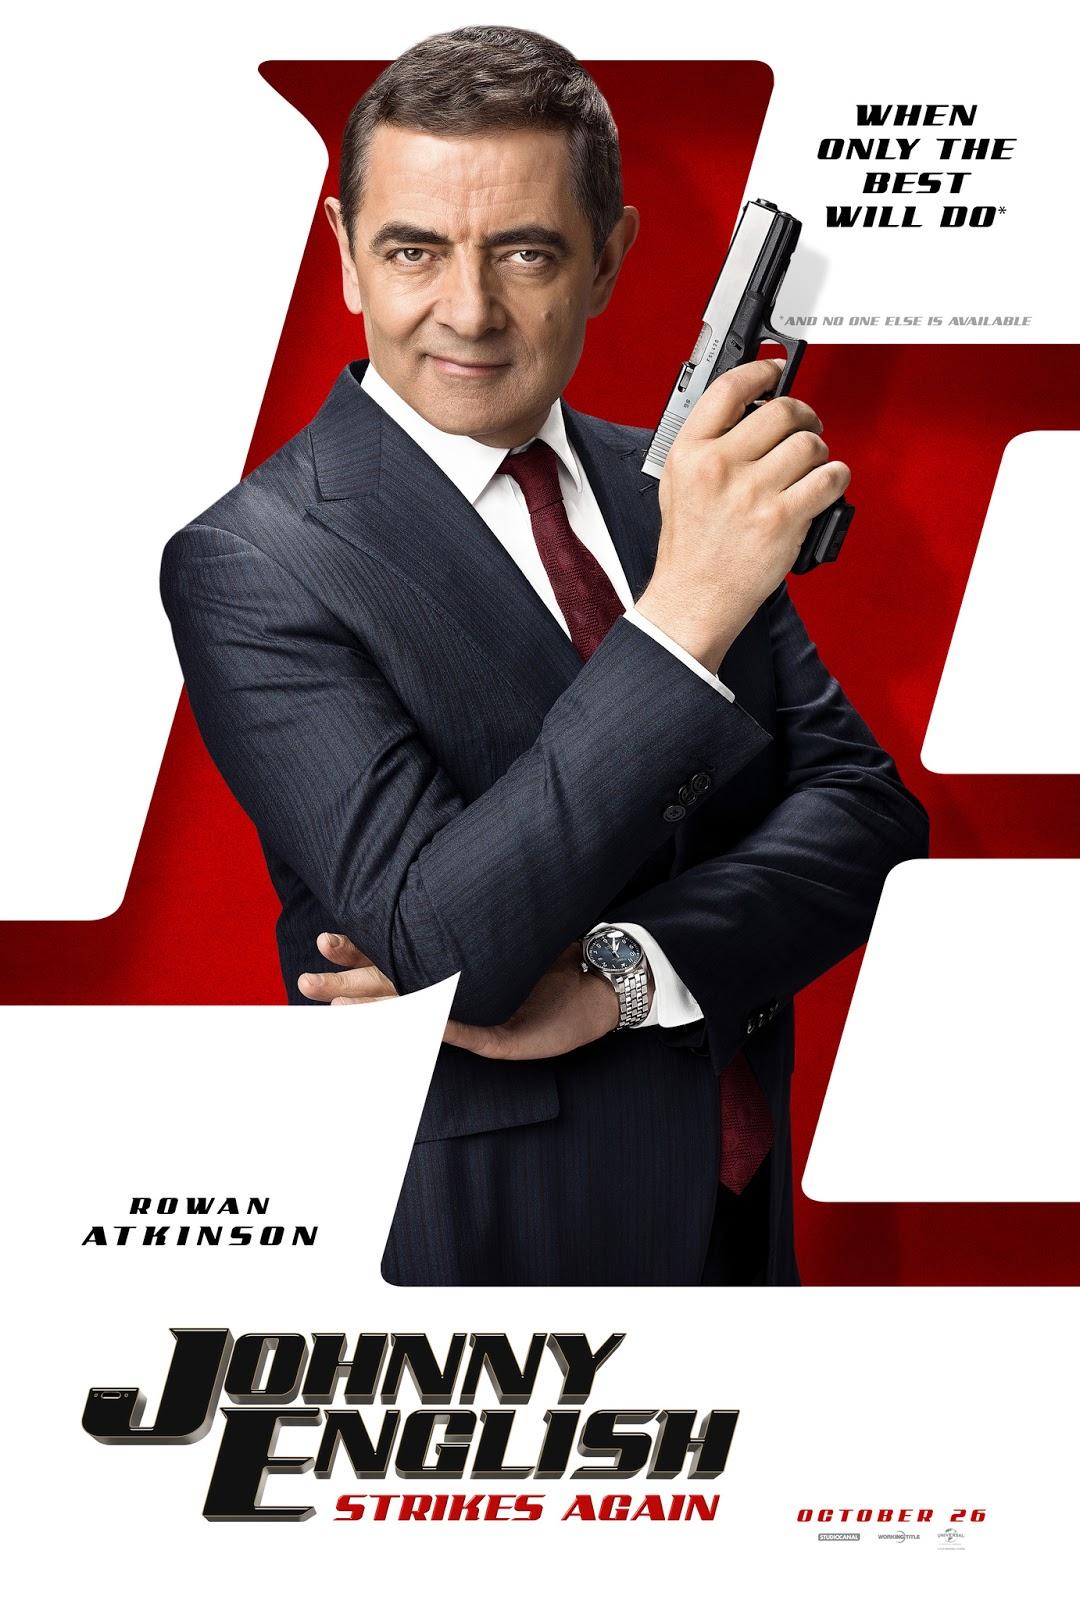 Johnny English Strikes Again 2018 Bluray 480p 720p 1080p